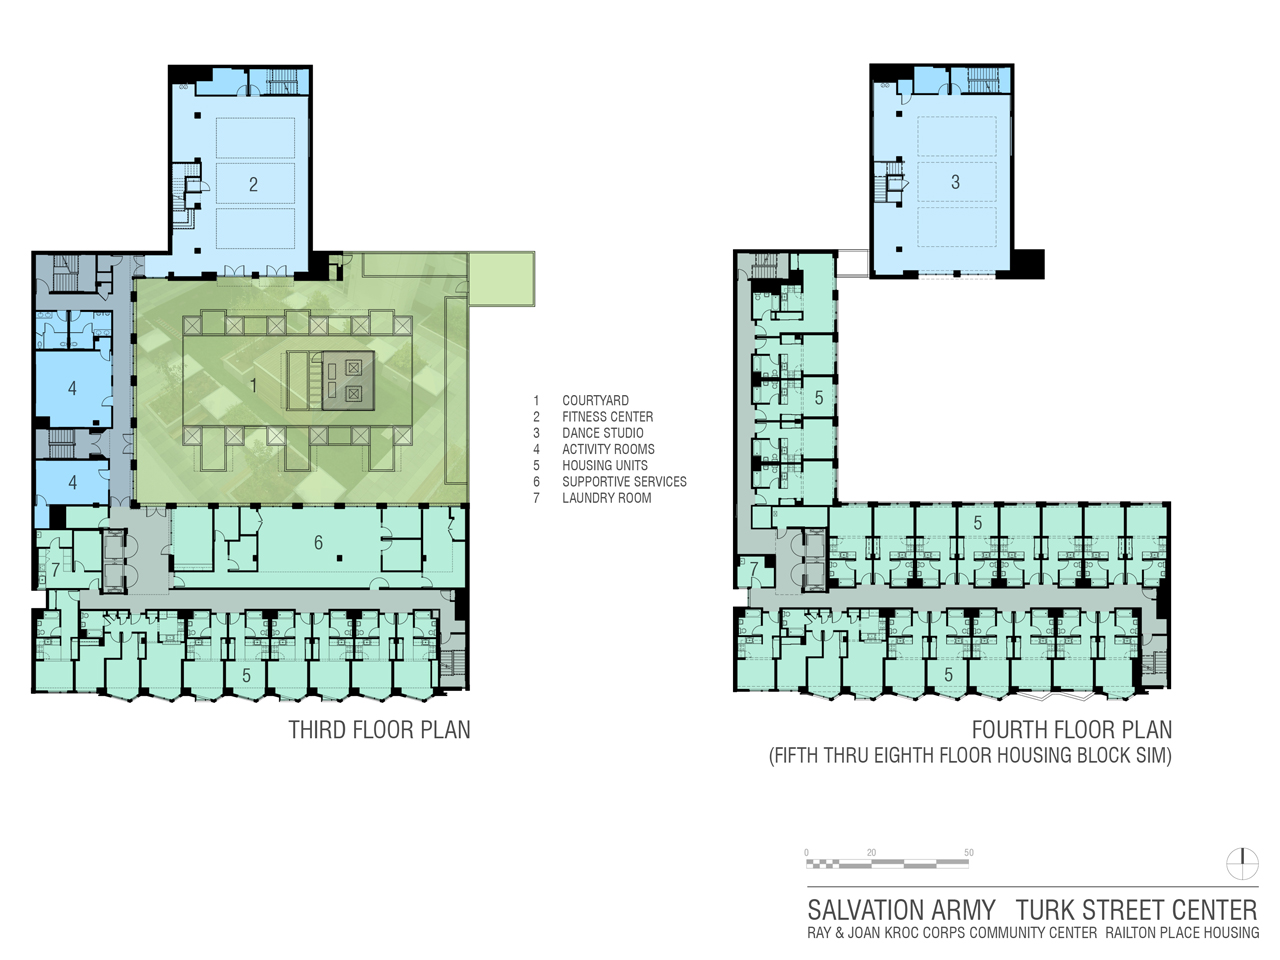 Third through Eighth floor plans